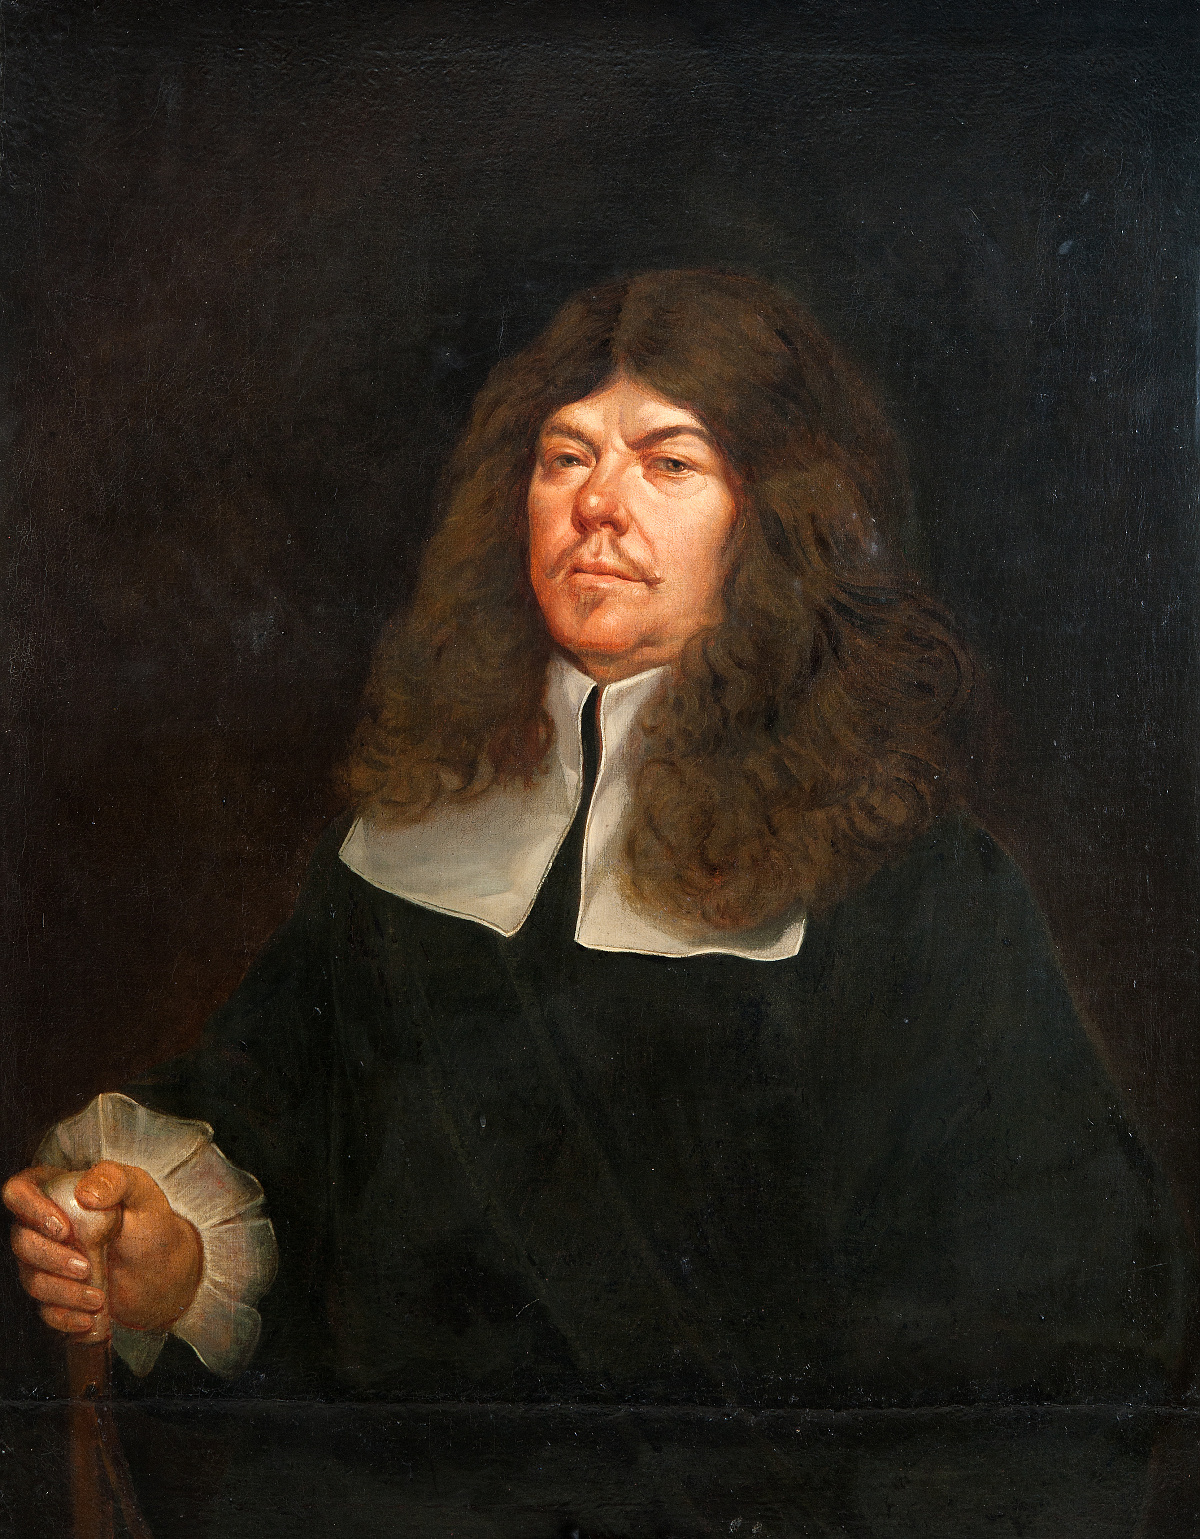 Anonym, Portrét Mikuláše Františka Turka ze Šturmfeldu a Rosenthalu, po 1643, olej na plátně, GHMP M-1578